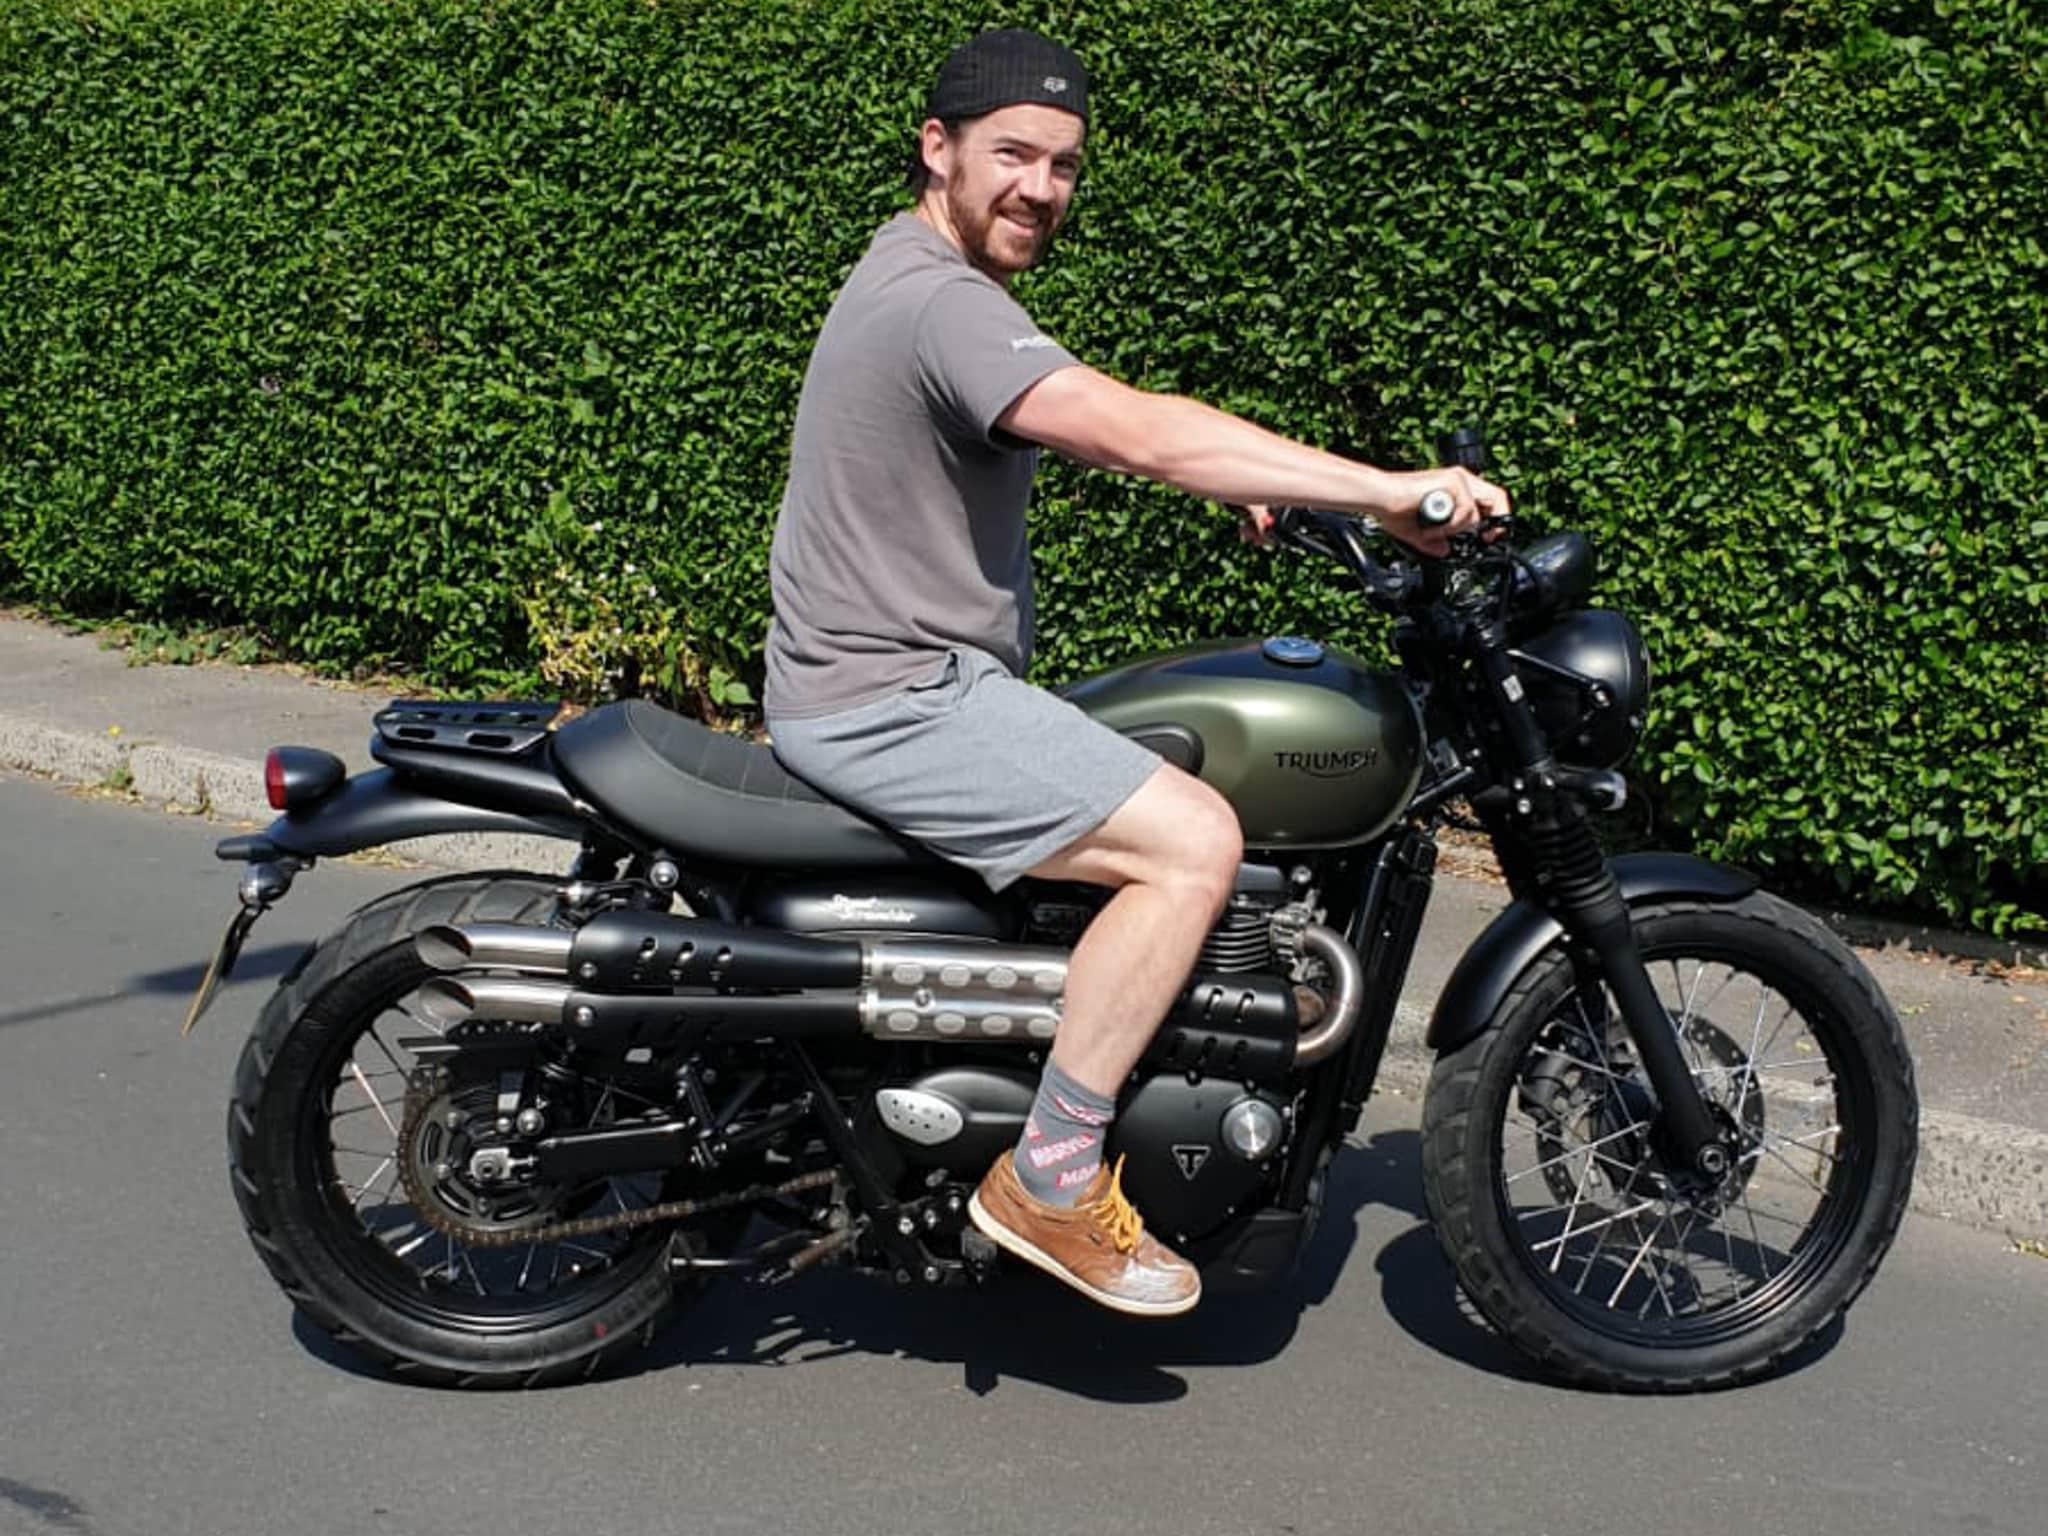 Winner Graeme Mcleish of a 2018 Triumph Street Scrambler 900cc… Custom ! 19th July